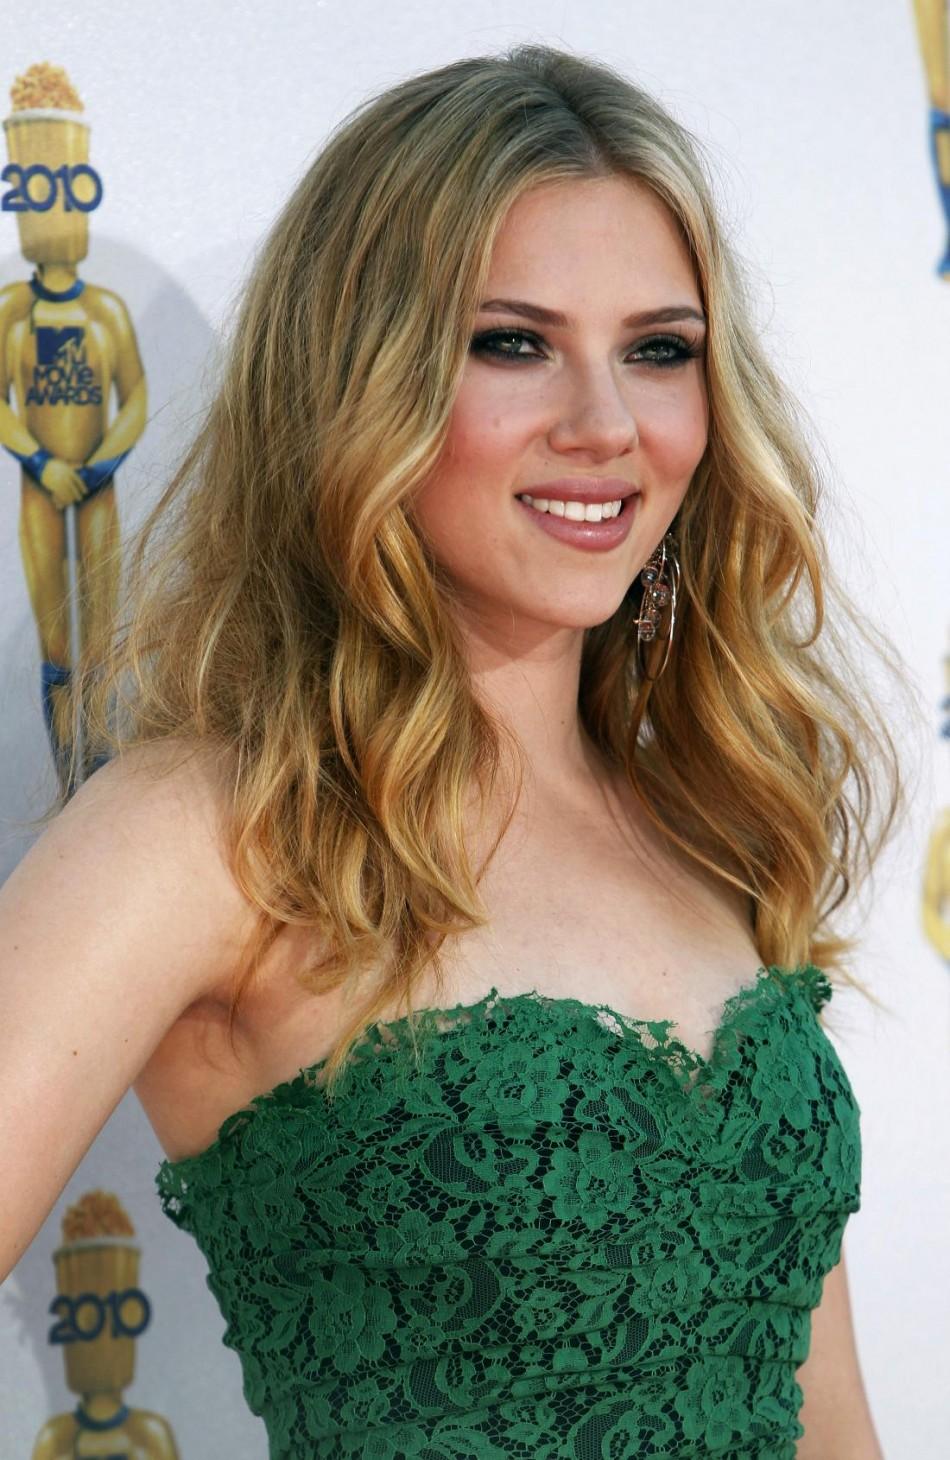 Actress Scarlett Johansson arrives at the 2010 MTV Movie Awards in Los Angeles.